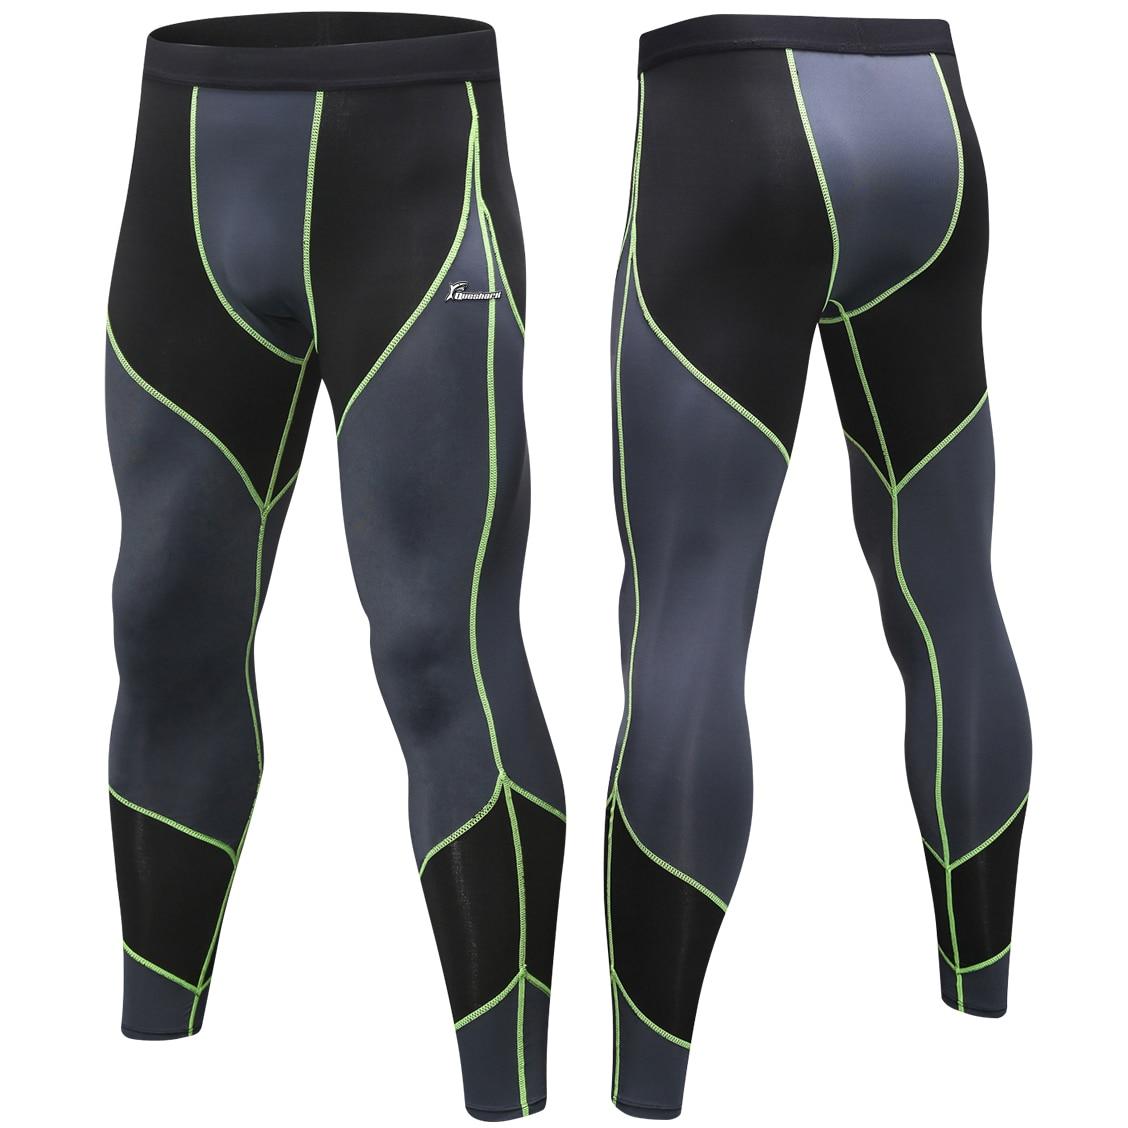 Mens Compression Workout Tights Under Base Layer Training Spandex Gym Sportswear